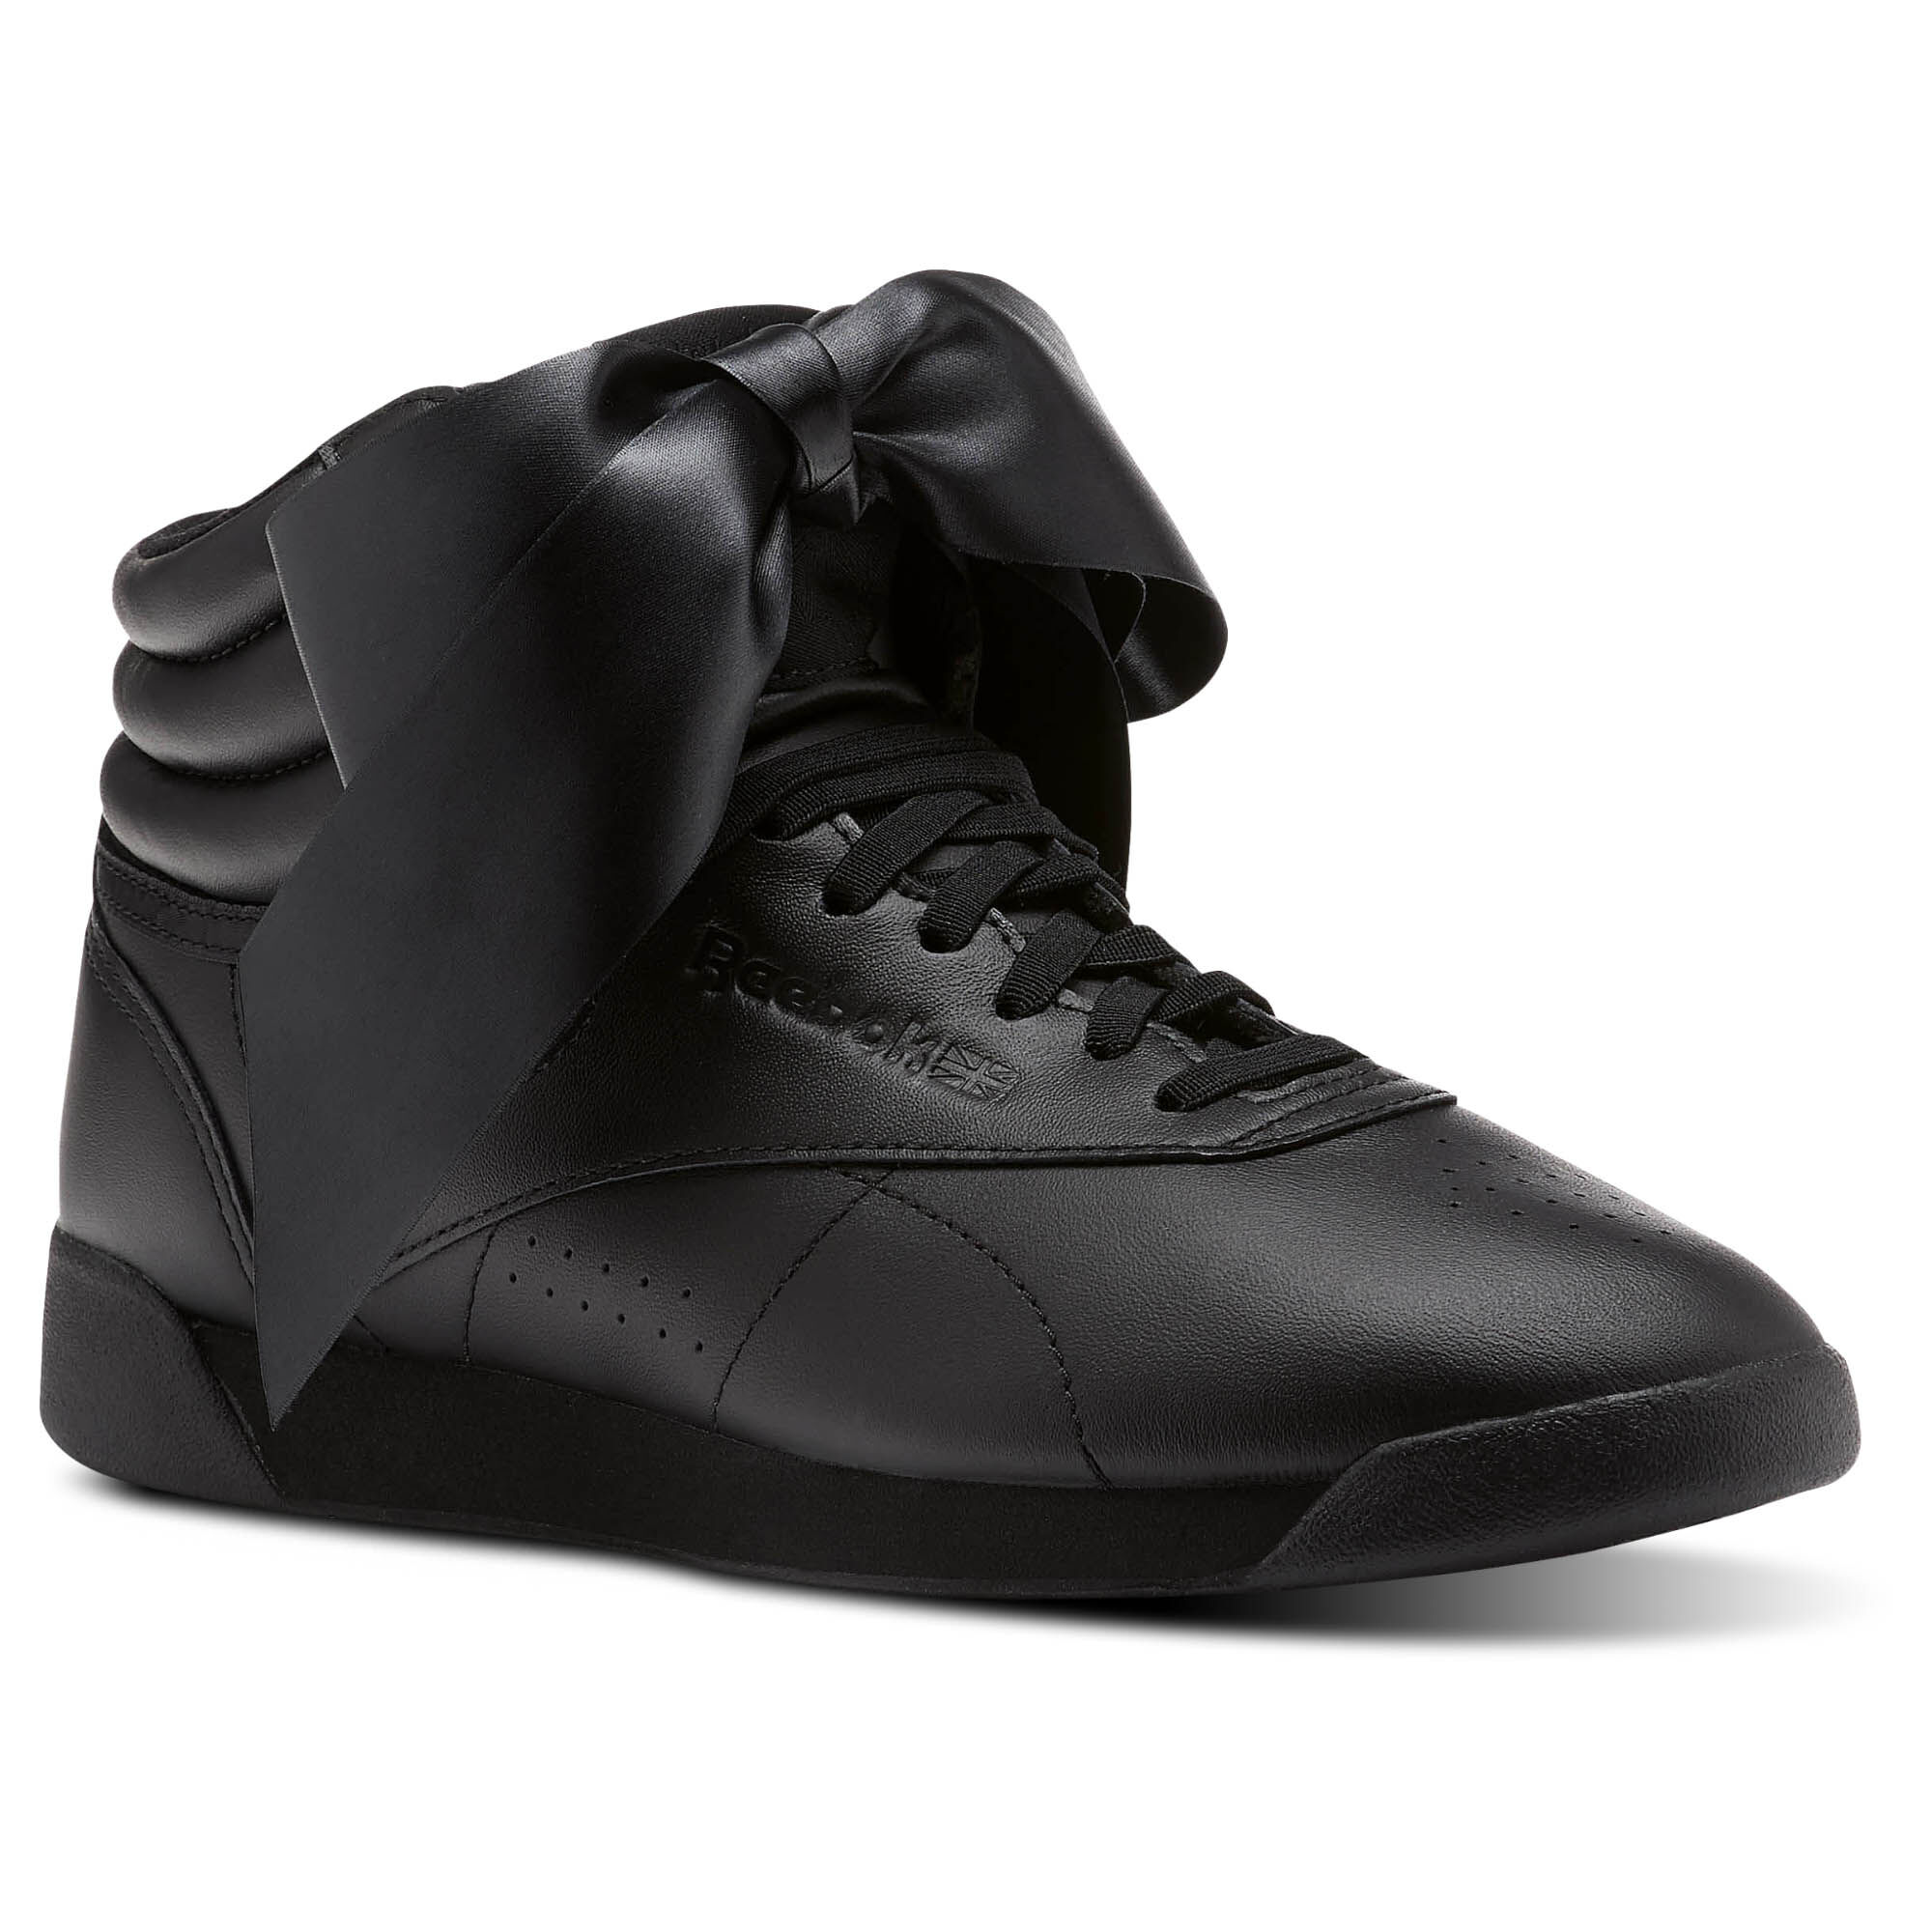 Reebok - Freestyle Hi Satin Bow Black/Skull Grey CM8904